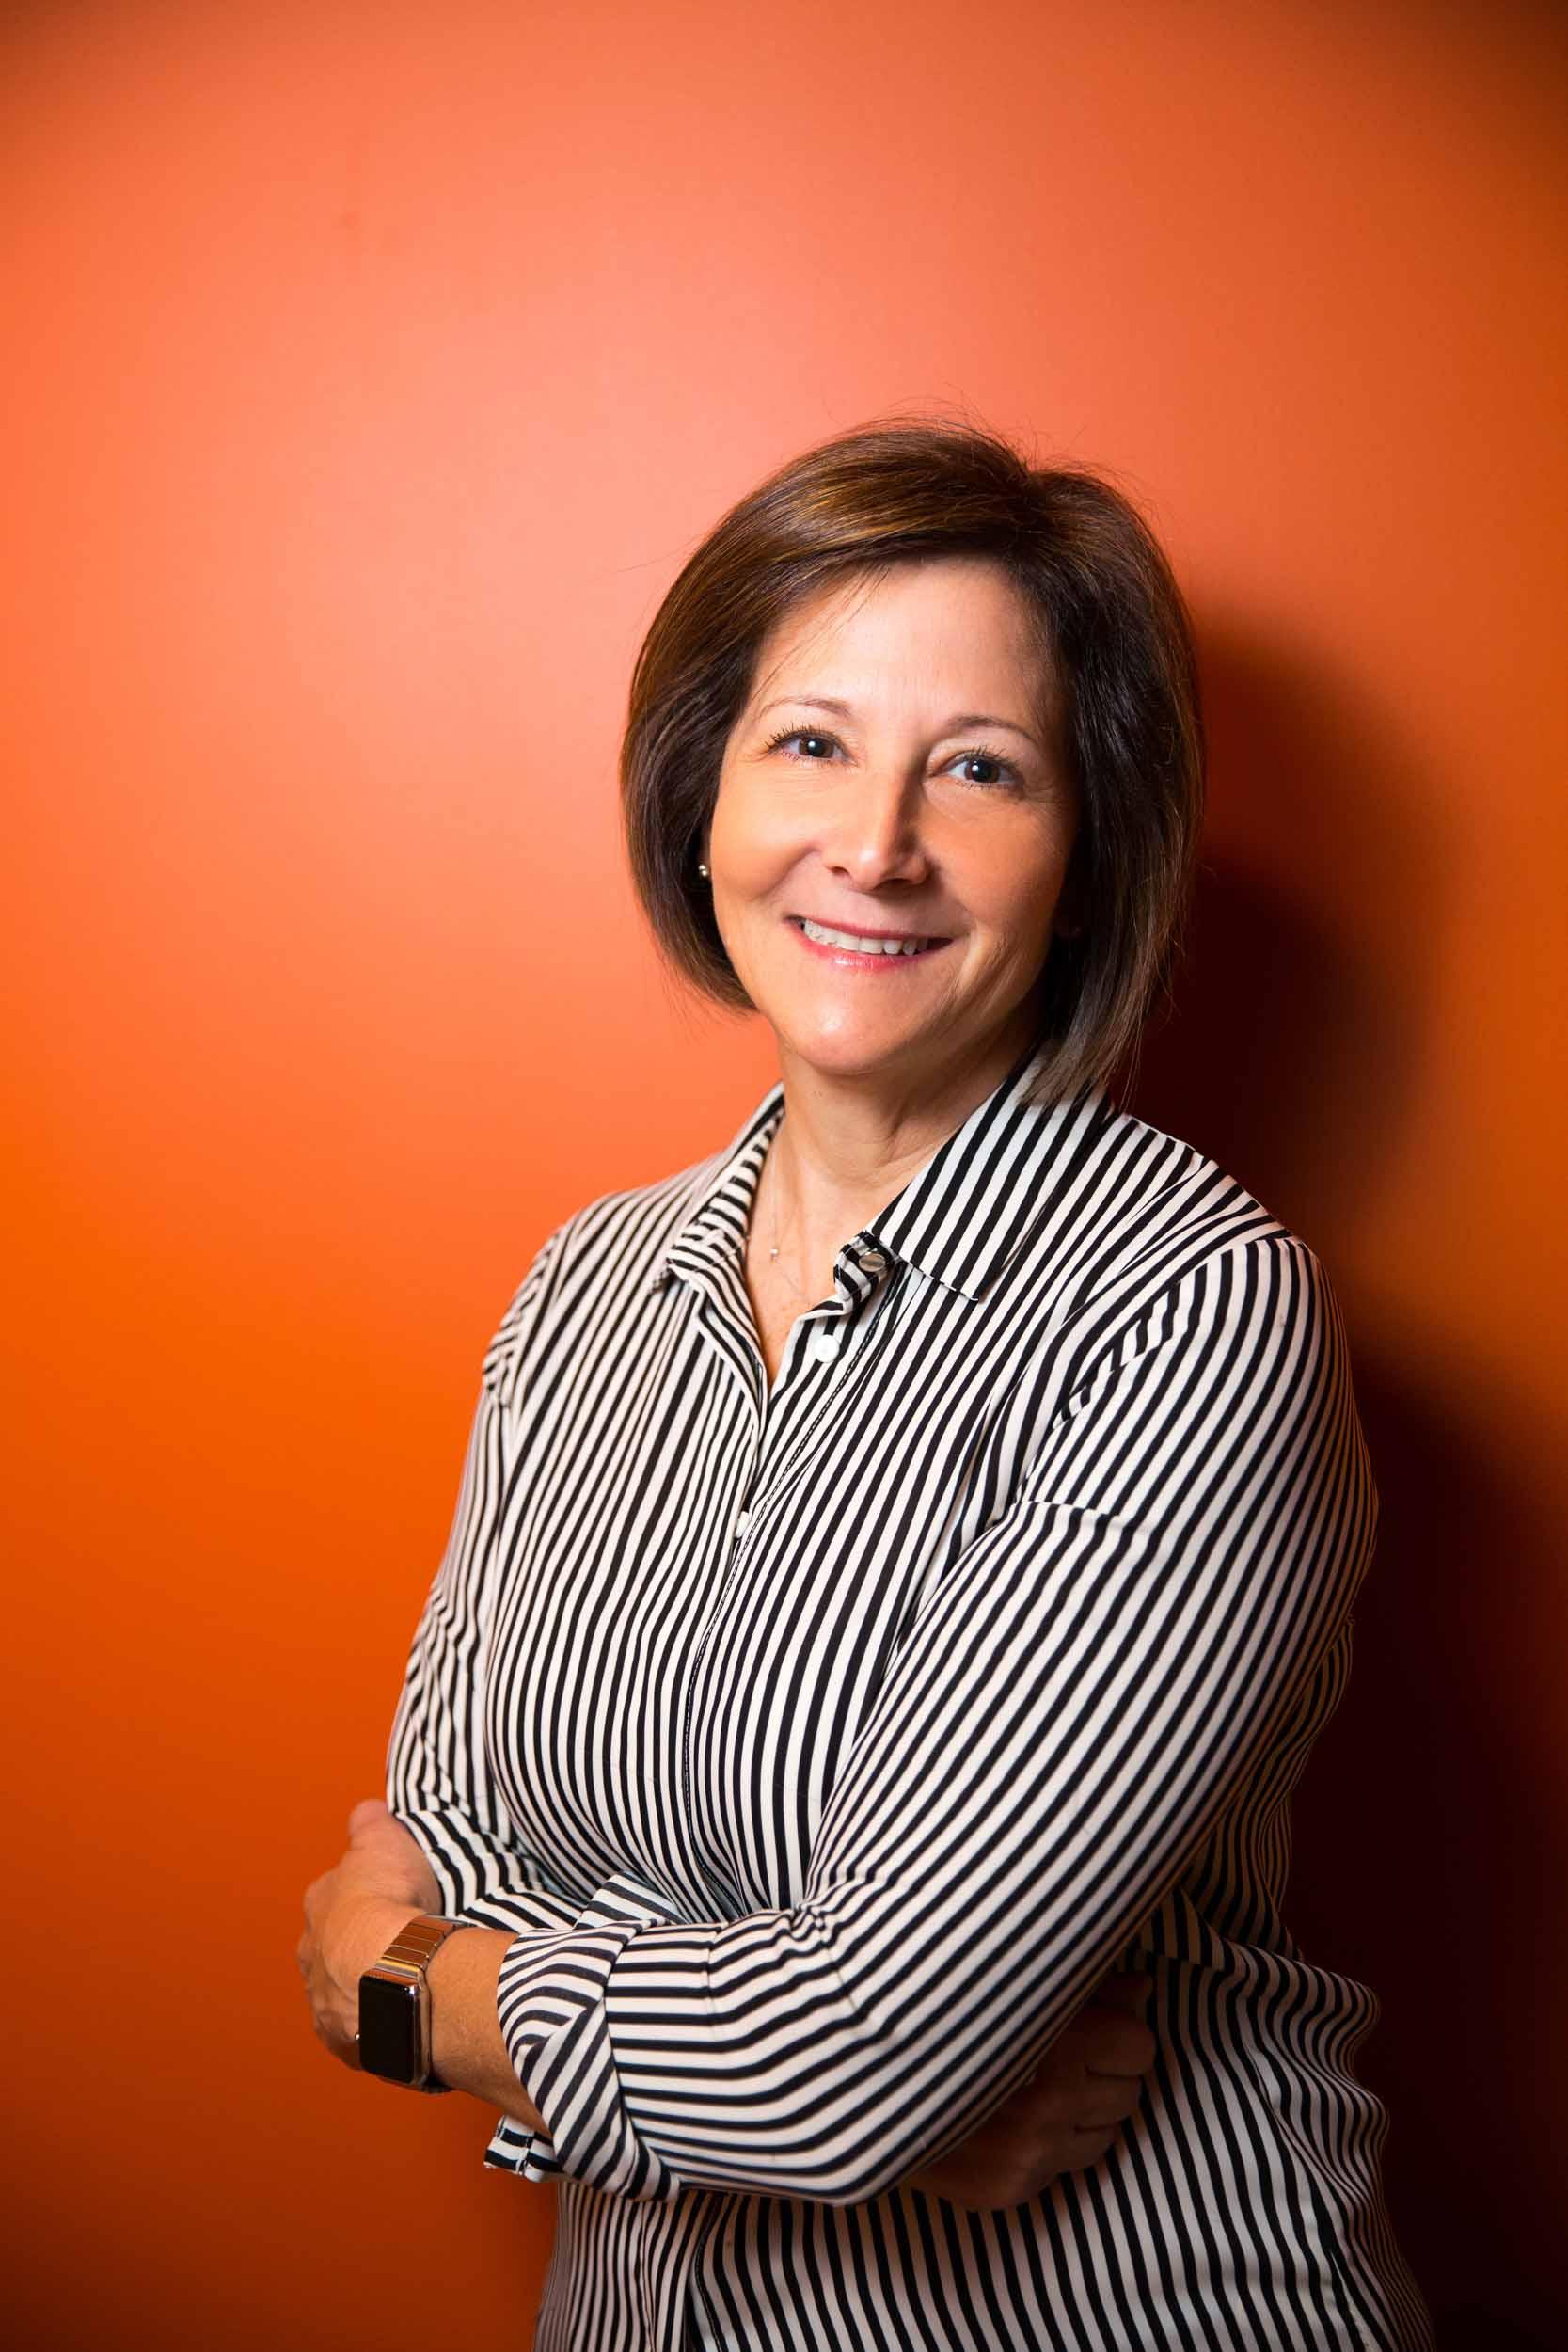 Darcy Antonellis – CEO Vubiquity, Burbank, California